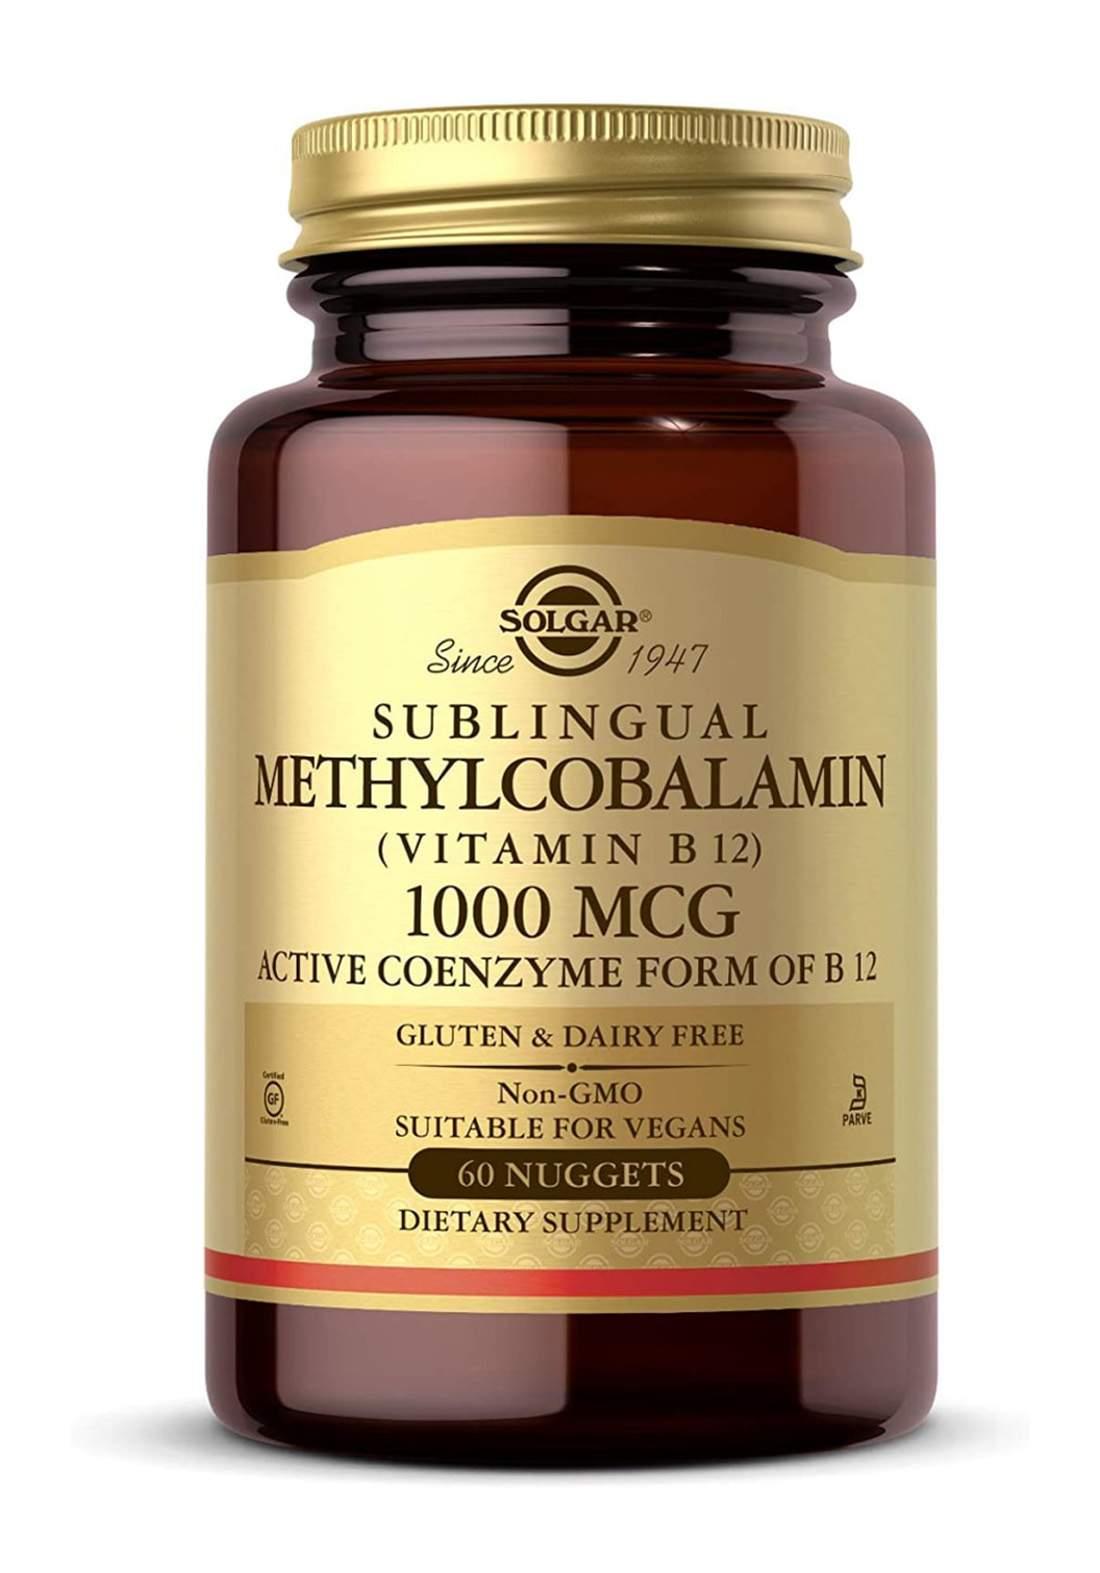 Solgar  Sublingual Methylcobalamin 1000 Mcg 60 Nuggets مكمل غذائي